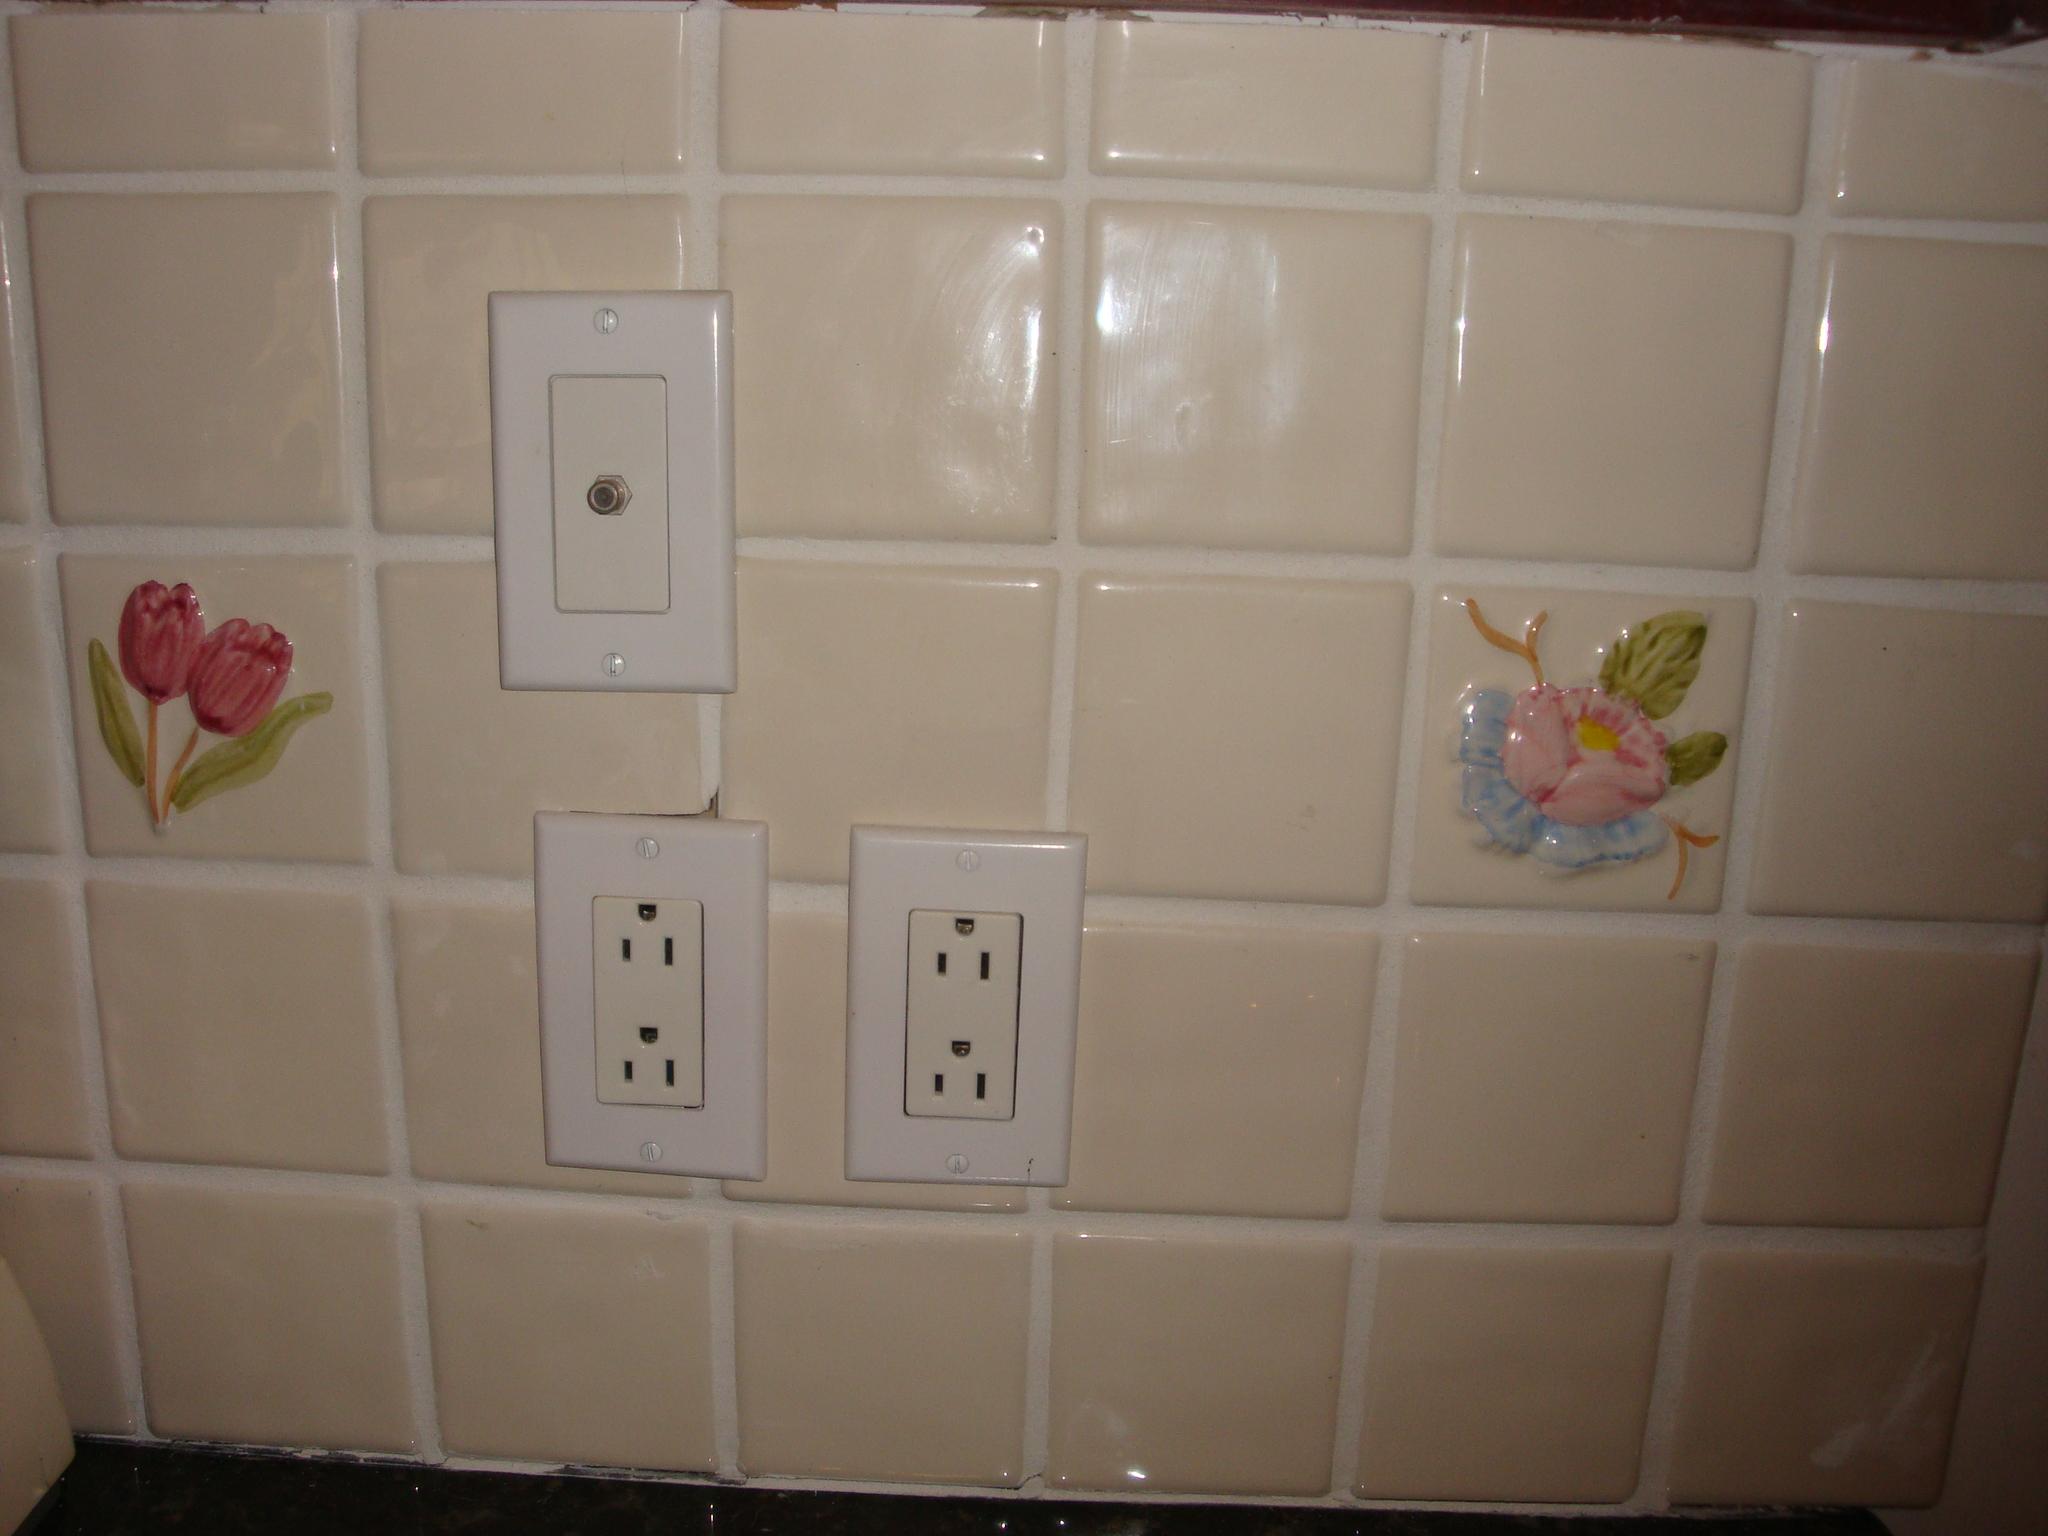 paint tile home garden gt home improvement gt plumbing painting kitchen backsplashes pictures ideas hgtv kitchen